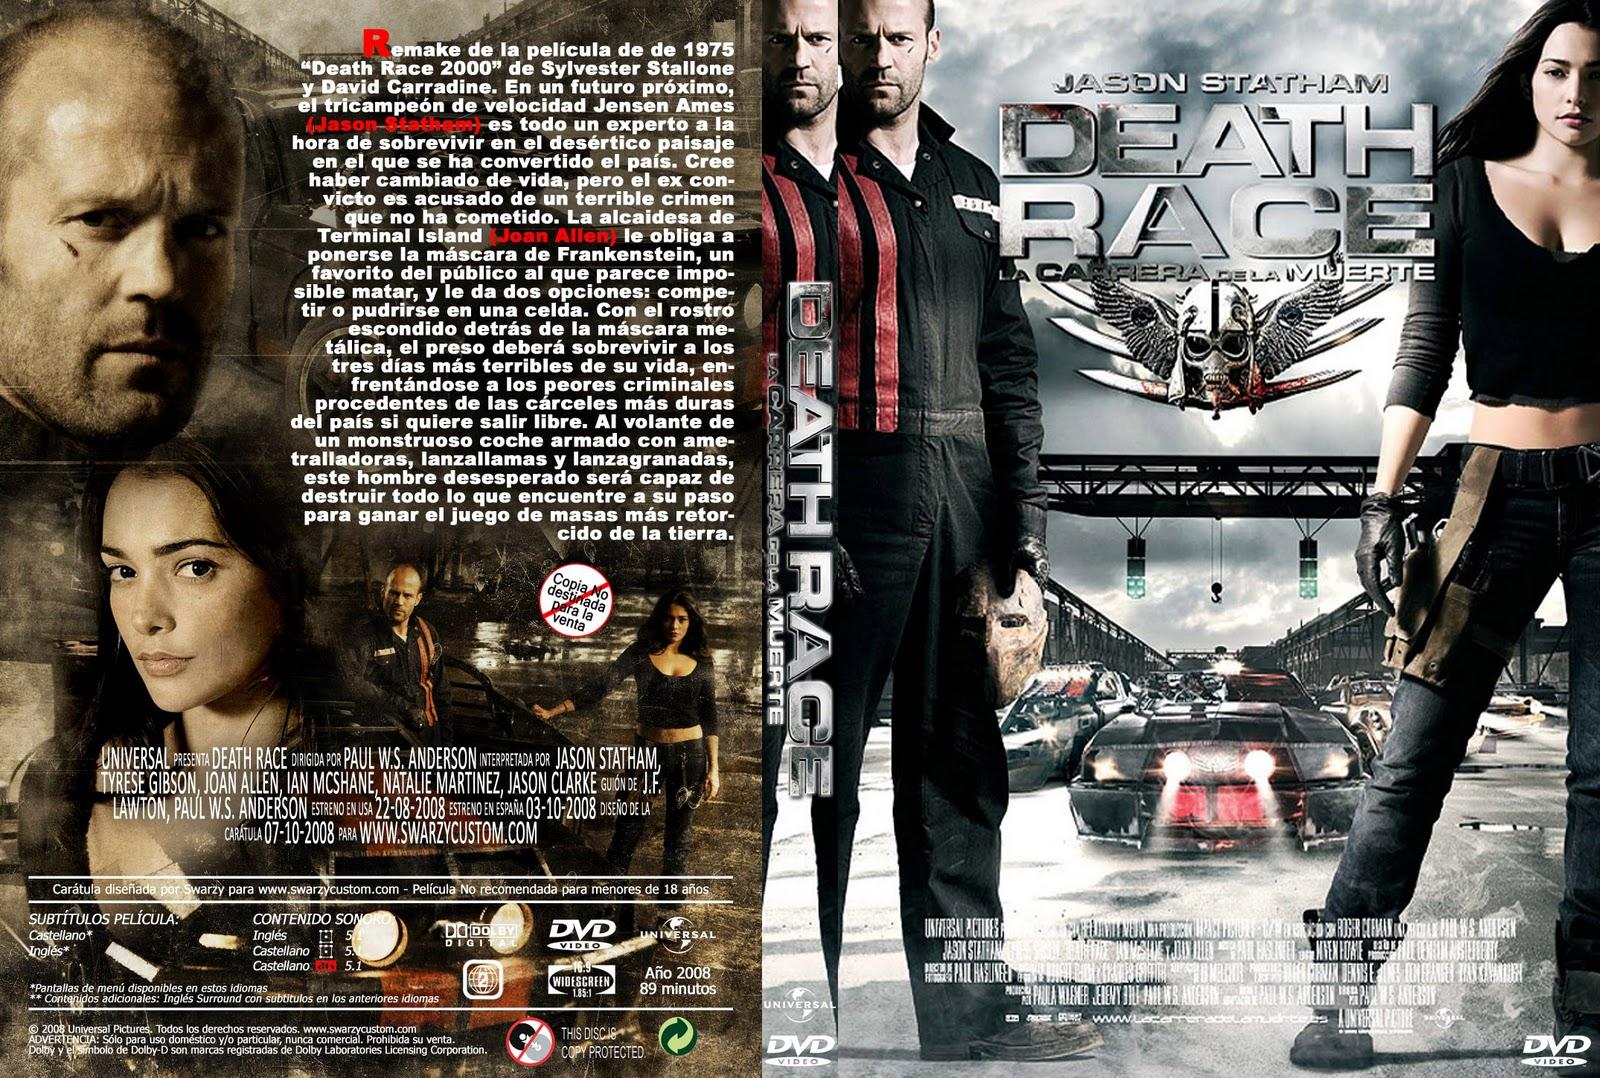 http://2.bp.blogspot.com/-1BxCUnwxpwQ/Tvoe66BaPOI/AAAAAAAABQk/utNeg8kmfKY/s1600/death_race_la_carrera_de_la_muerte_cajadvd.jpg